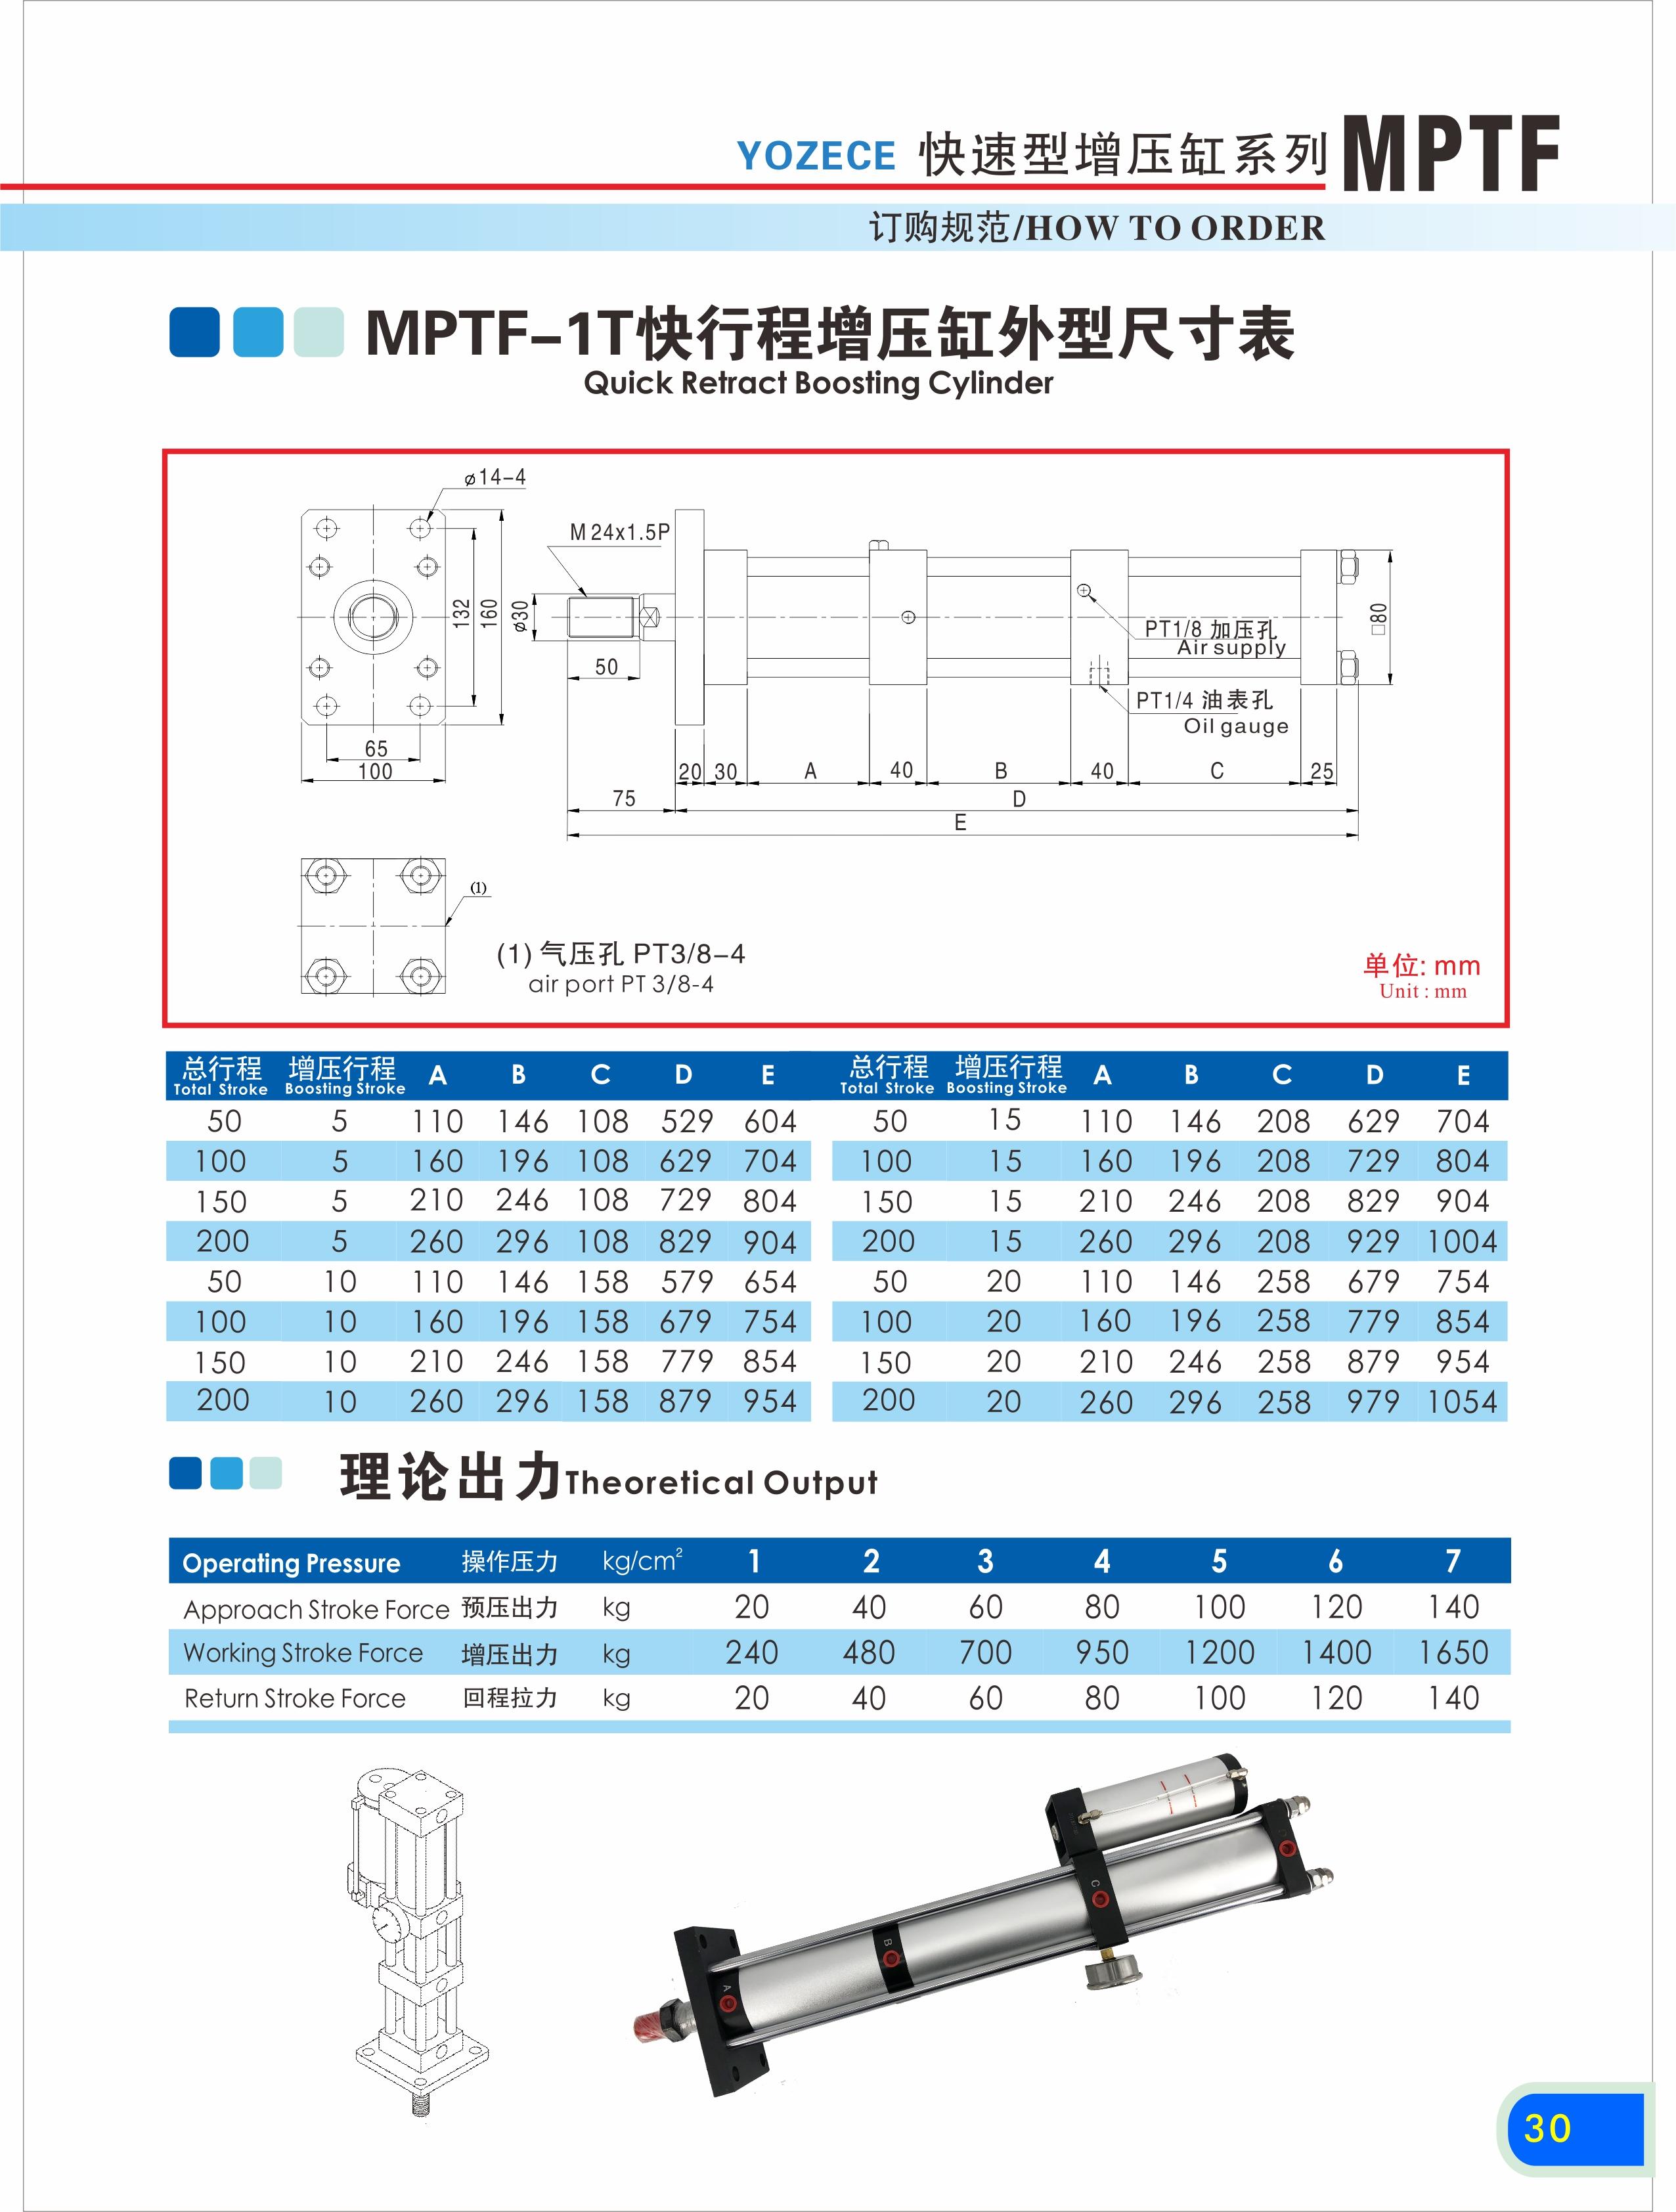 High-Speed Boosing Cylinder series